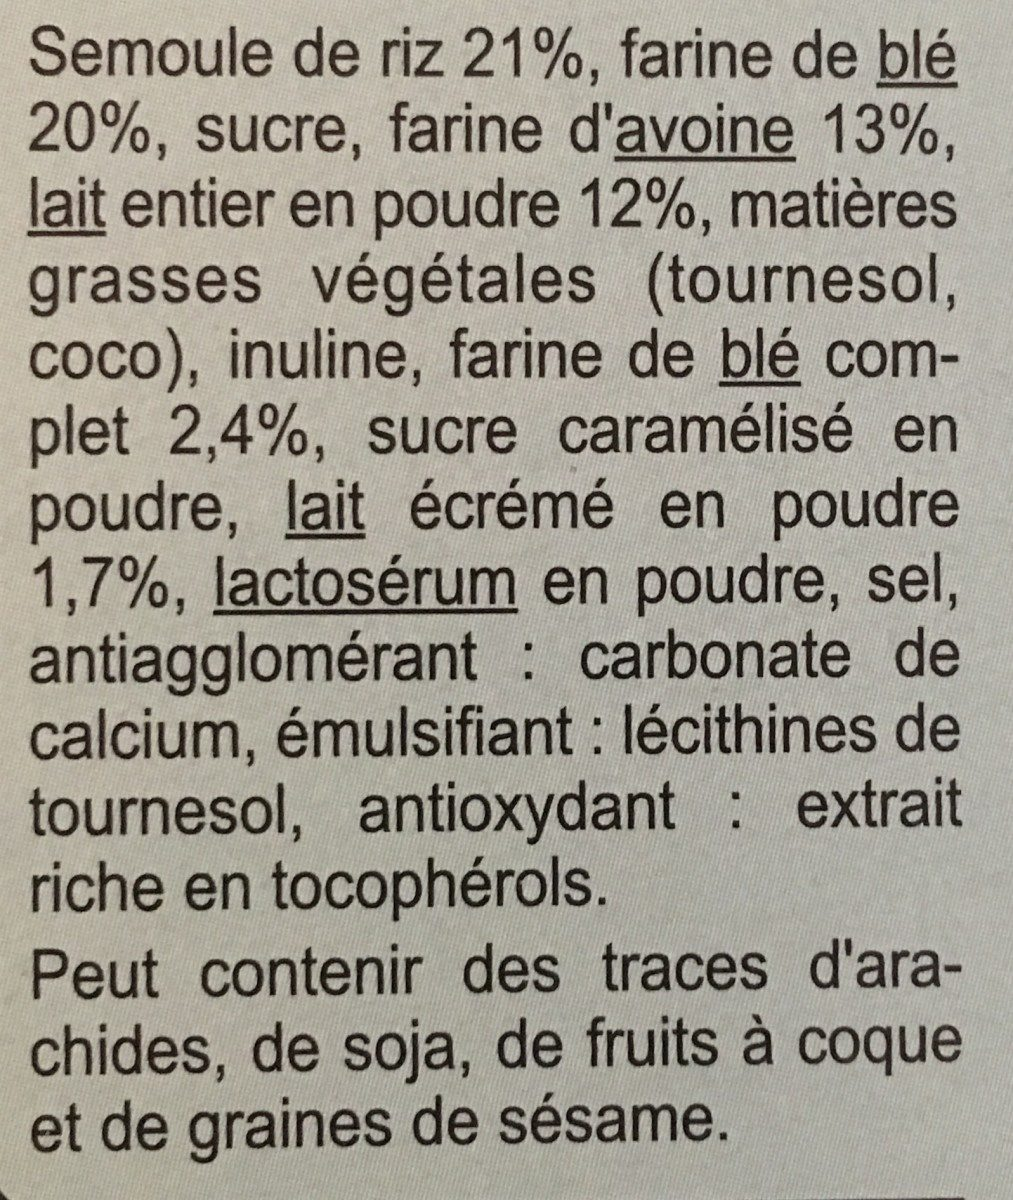 Xtrem lait - Cœur fondant - Ingrediënten - fr